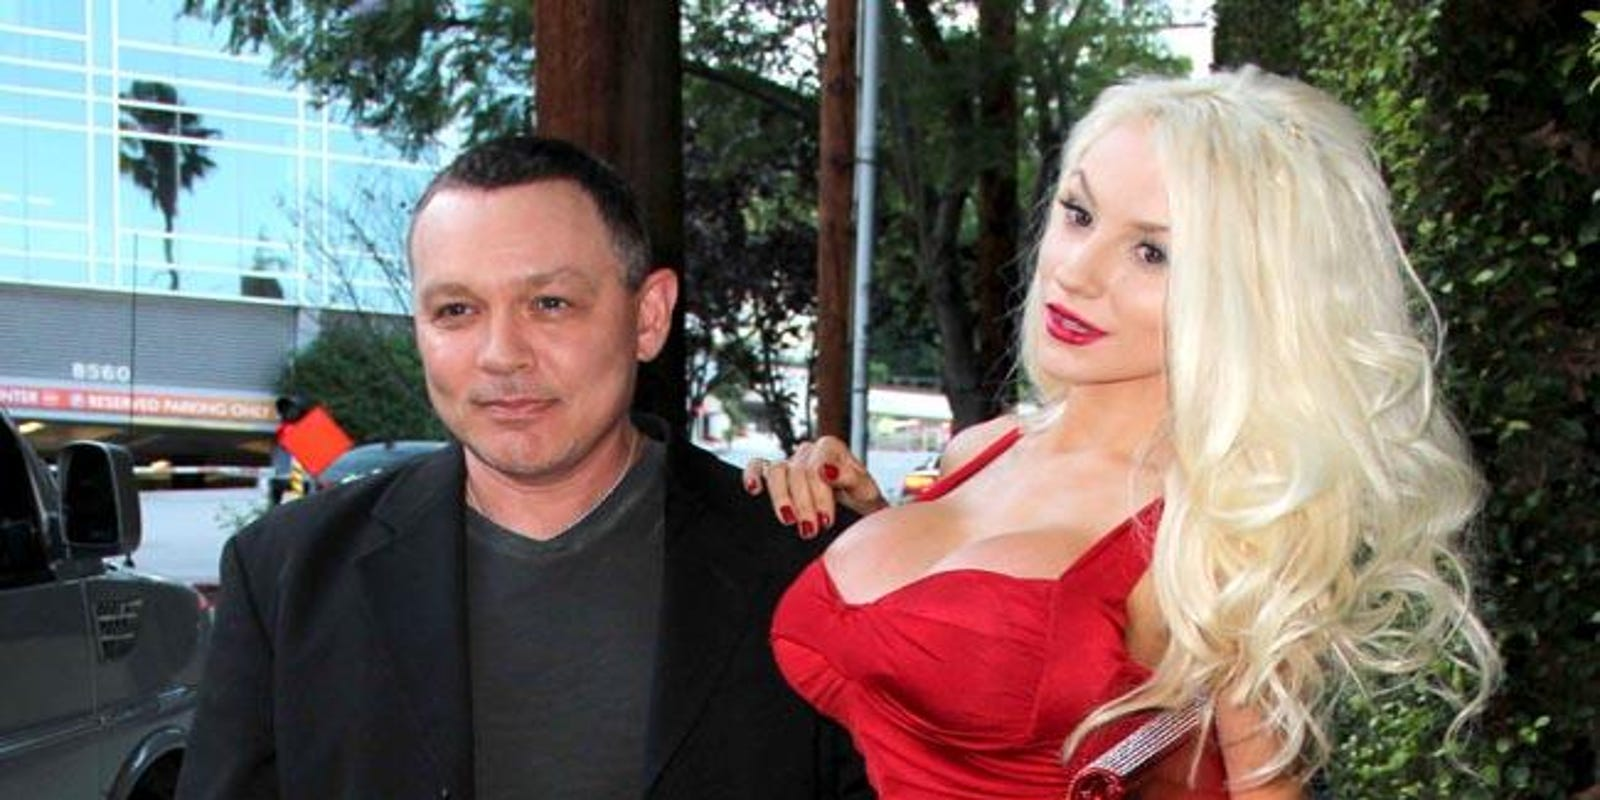 Angela Molina Sexy courtney stodden donating sex tape money to charity